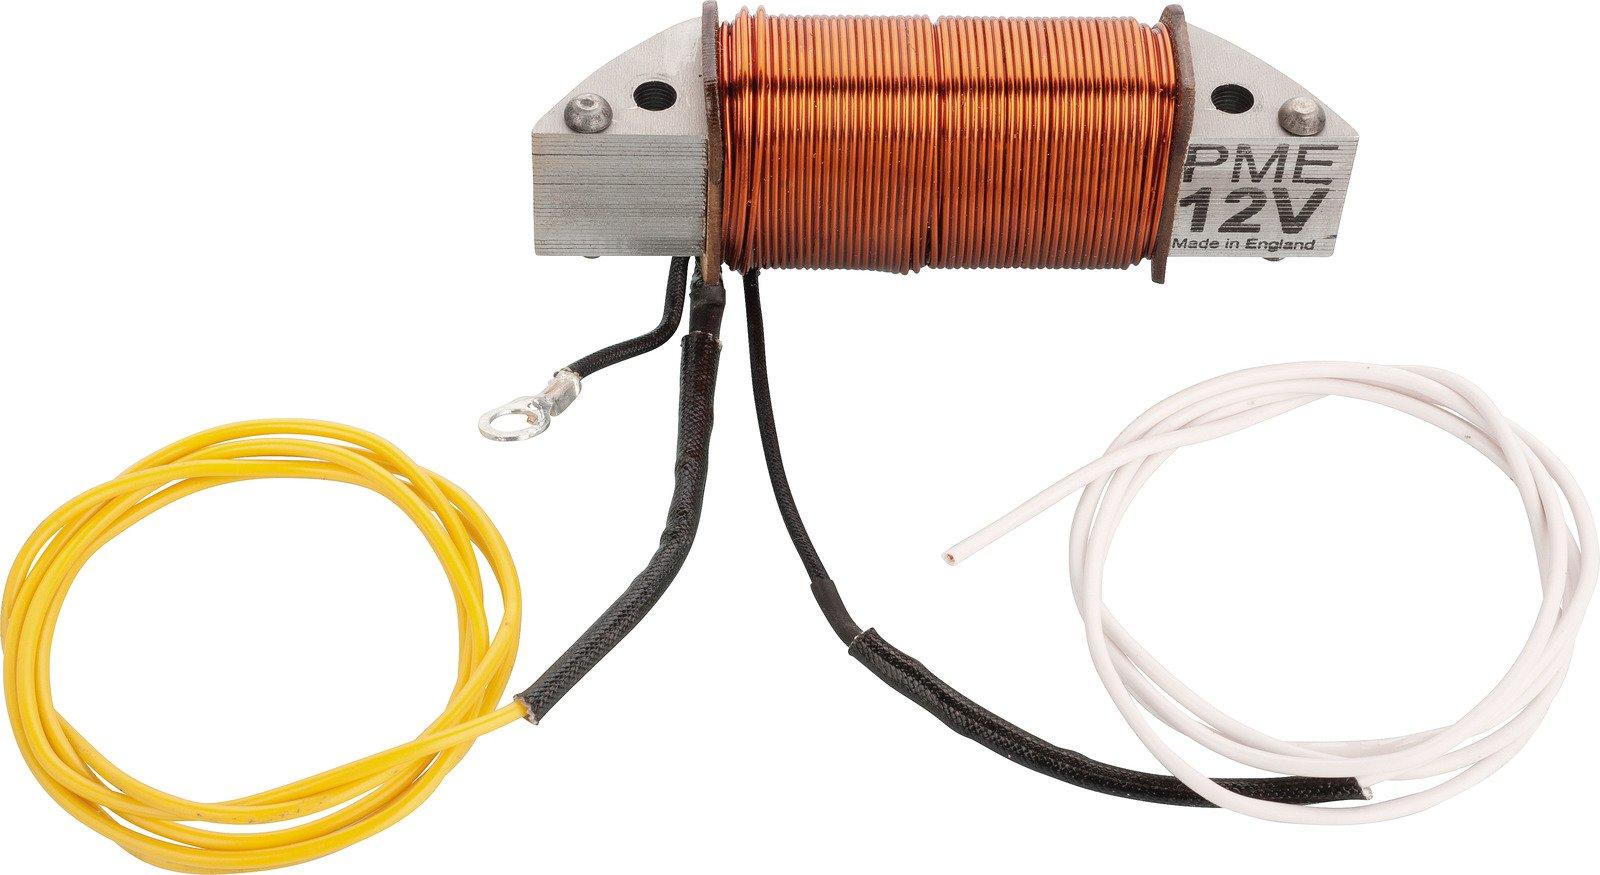 hight resolution of yamaha xt500 power lighting coil 12v 90w for 12v conversions 1078